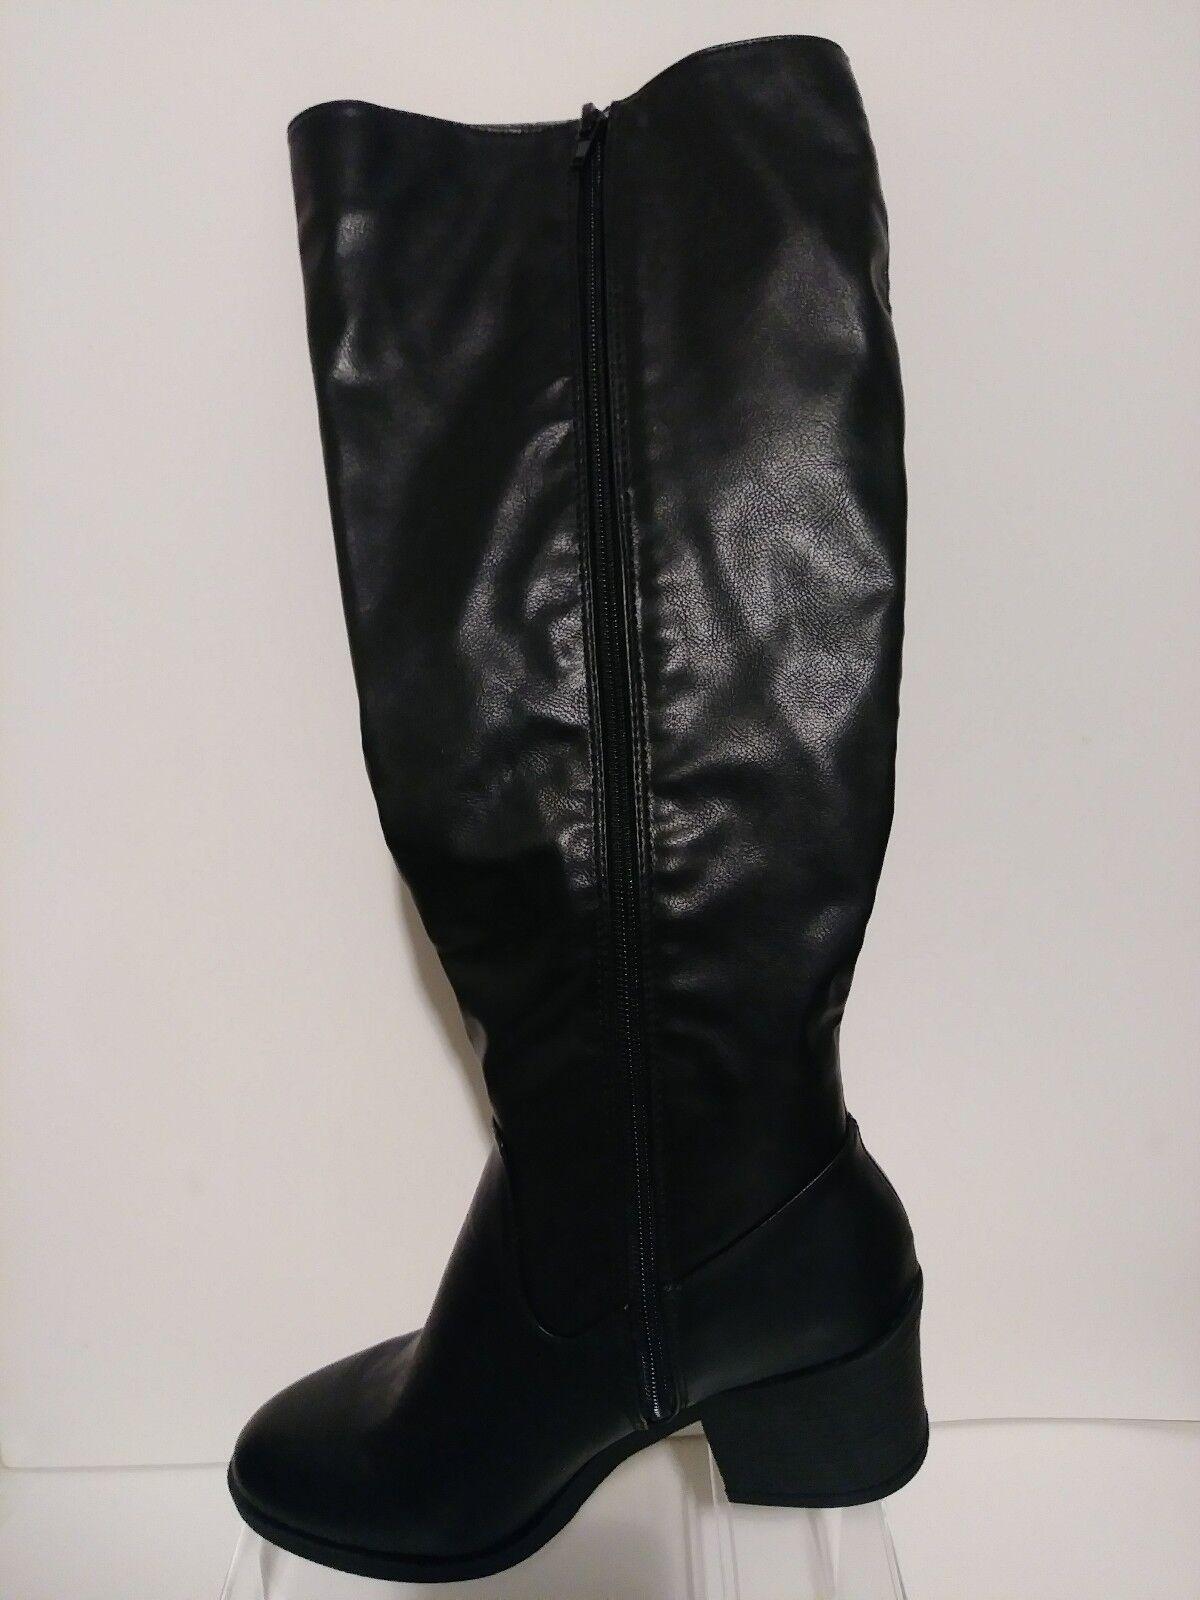 Mujer botas Hasta Hasta Hasta La Rodilla Negro Talla 11 13585d